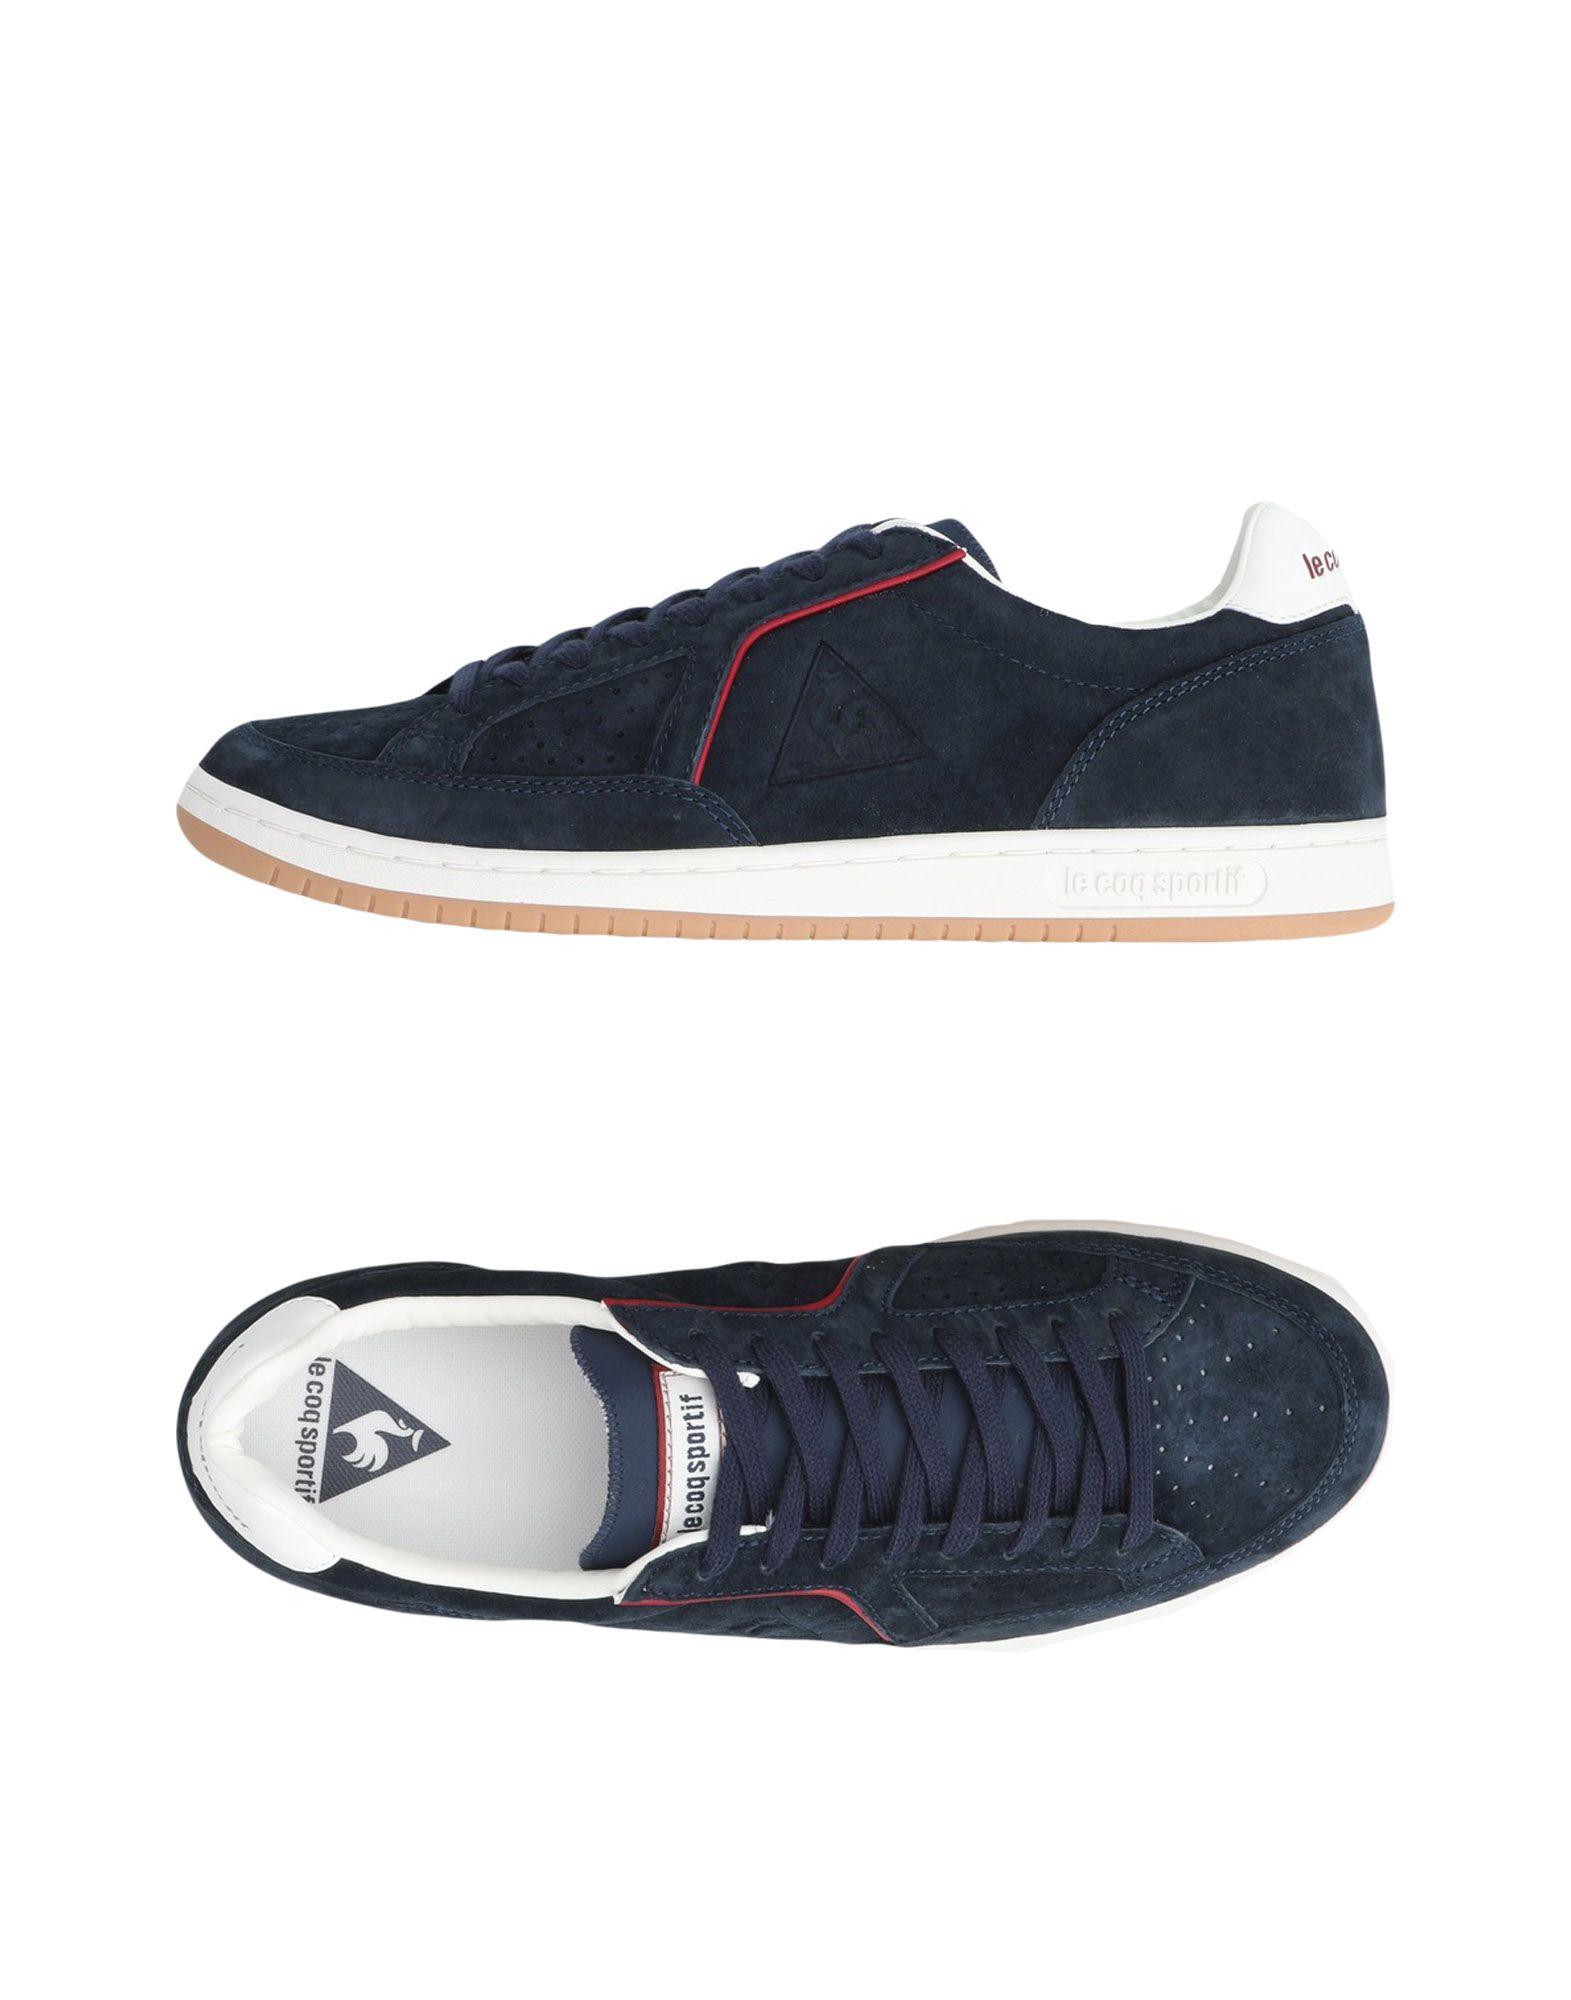 Sneakers Le Coq Sportif Icons Nubuck - Uomo - 11340651AD